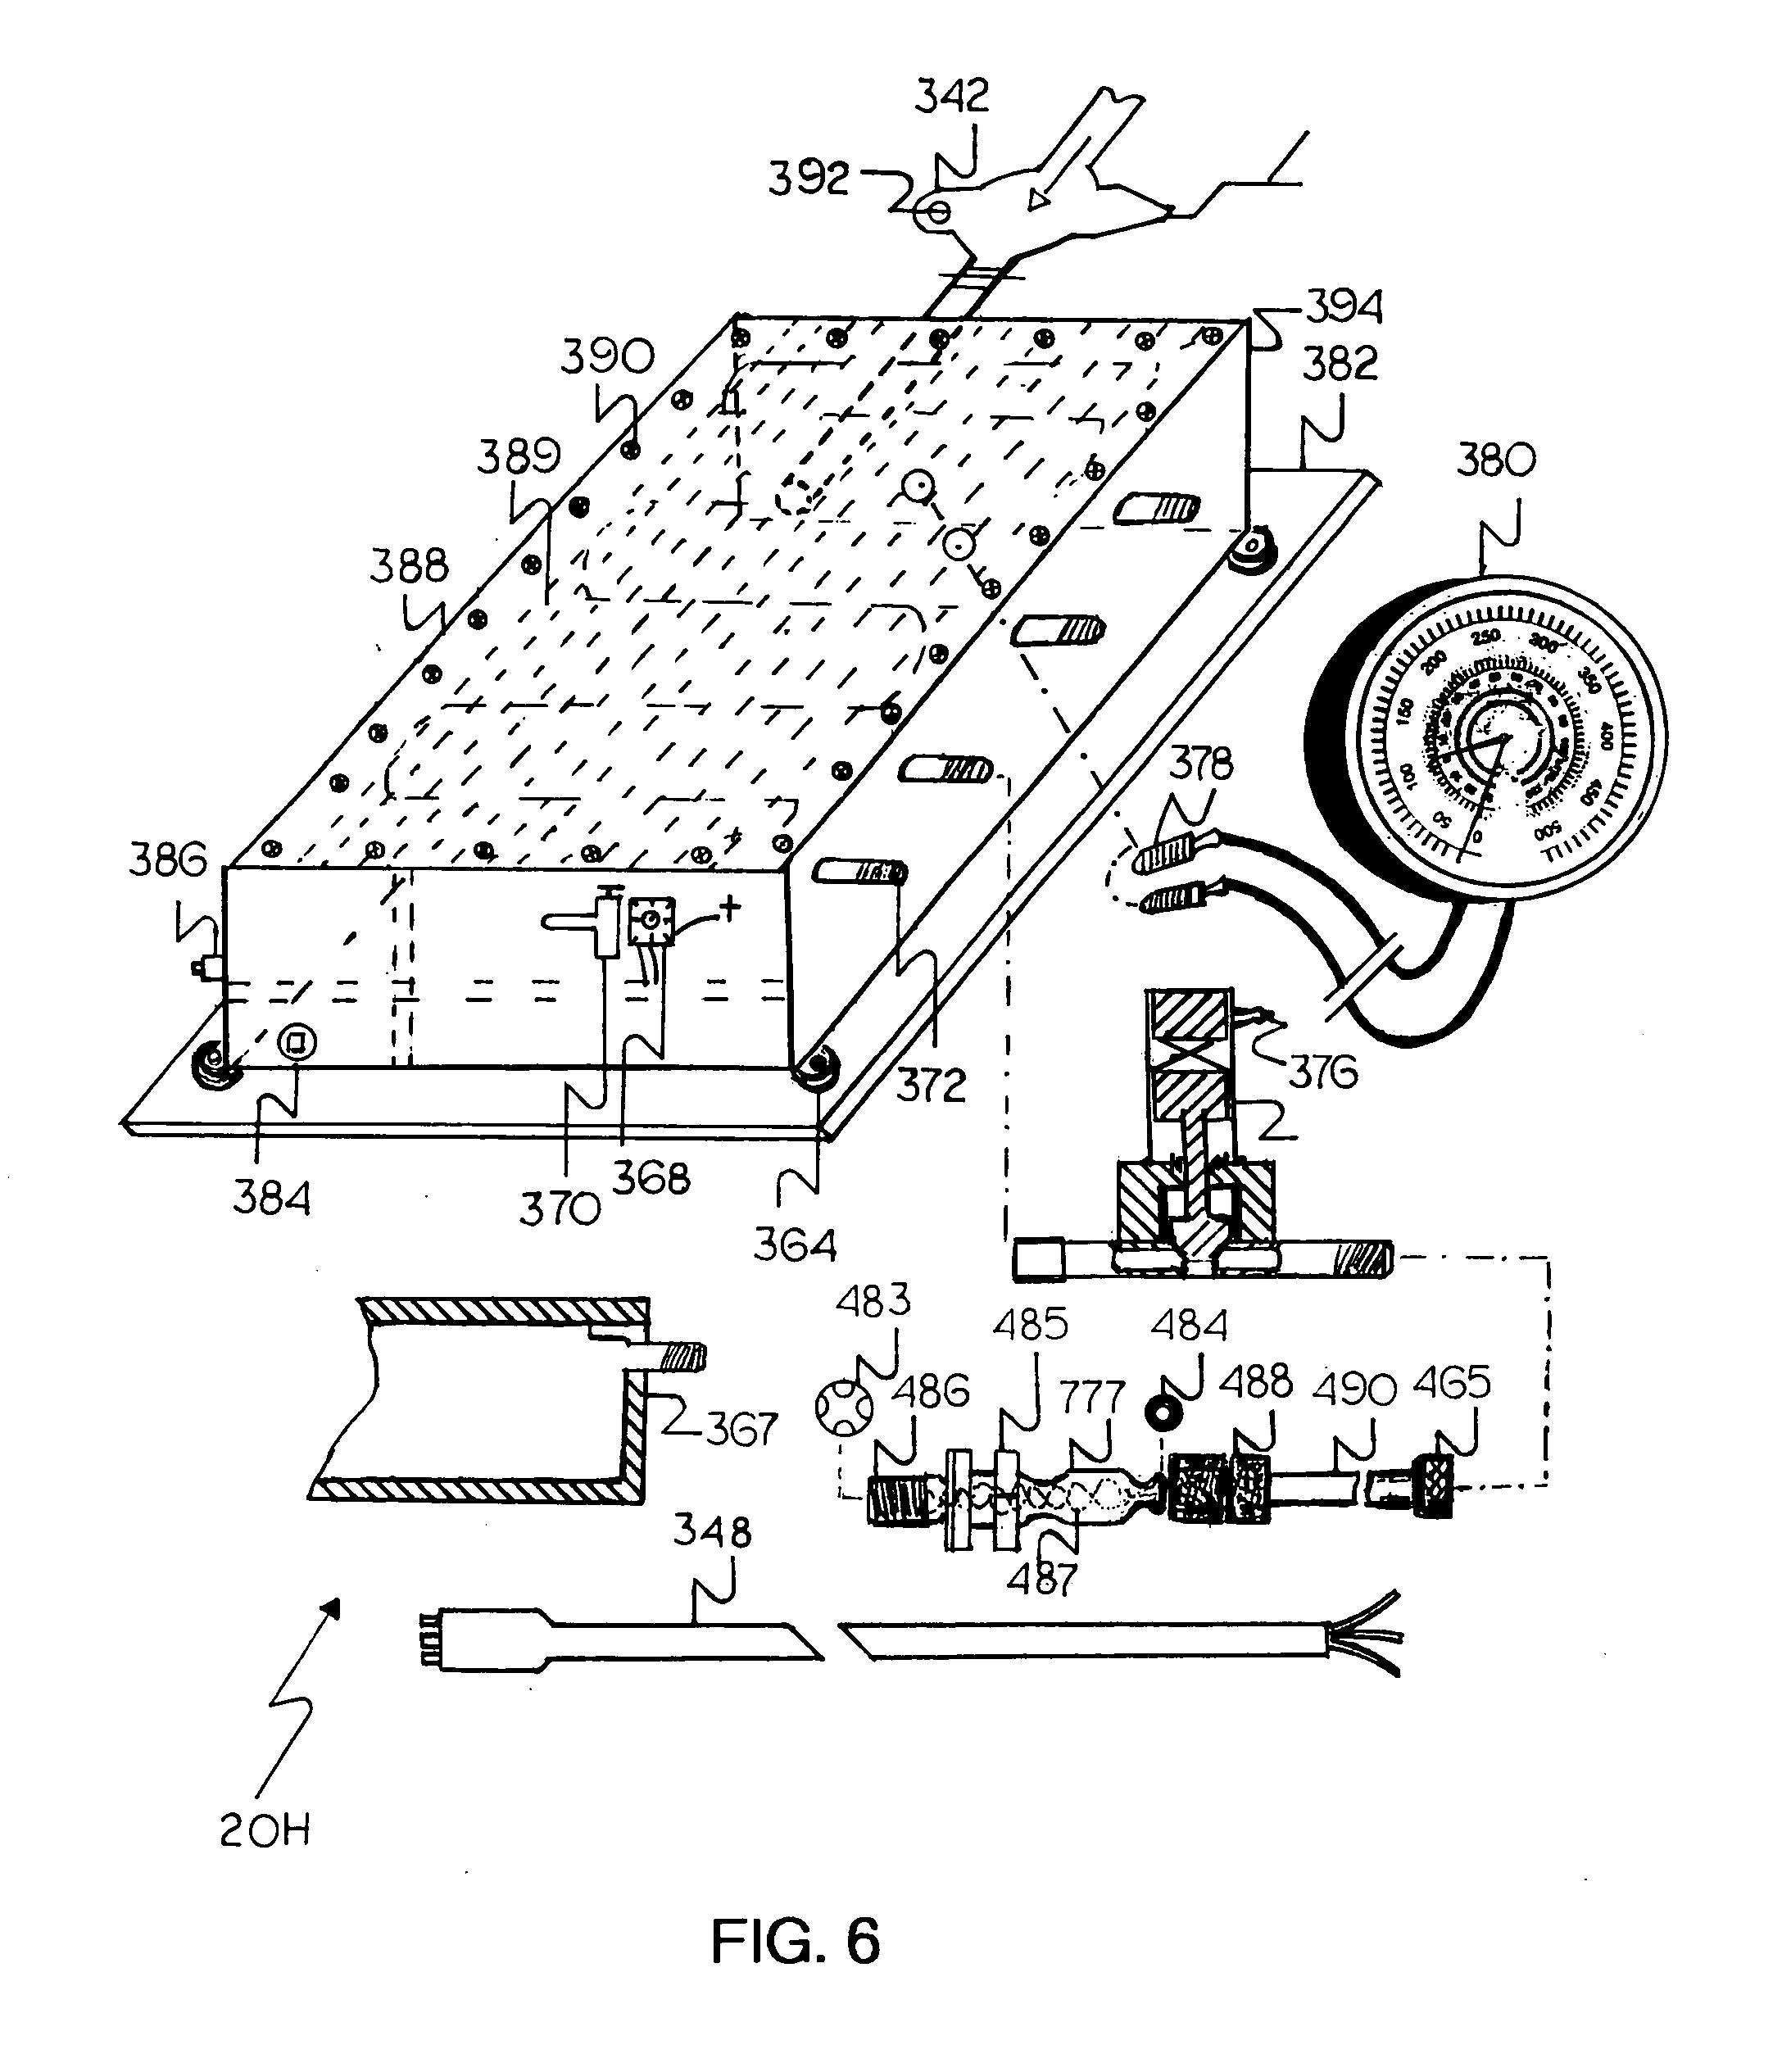 hobart dishwasher wiring diagrams hobart get free image hobart sr24h  dishwasher wiring diagram hobart cna dishwasher